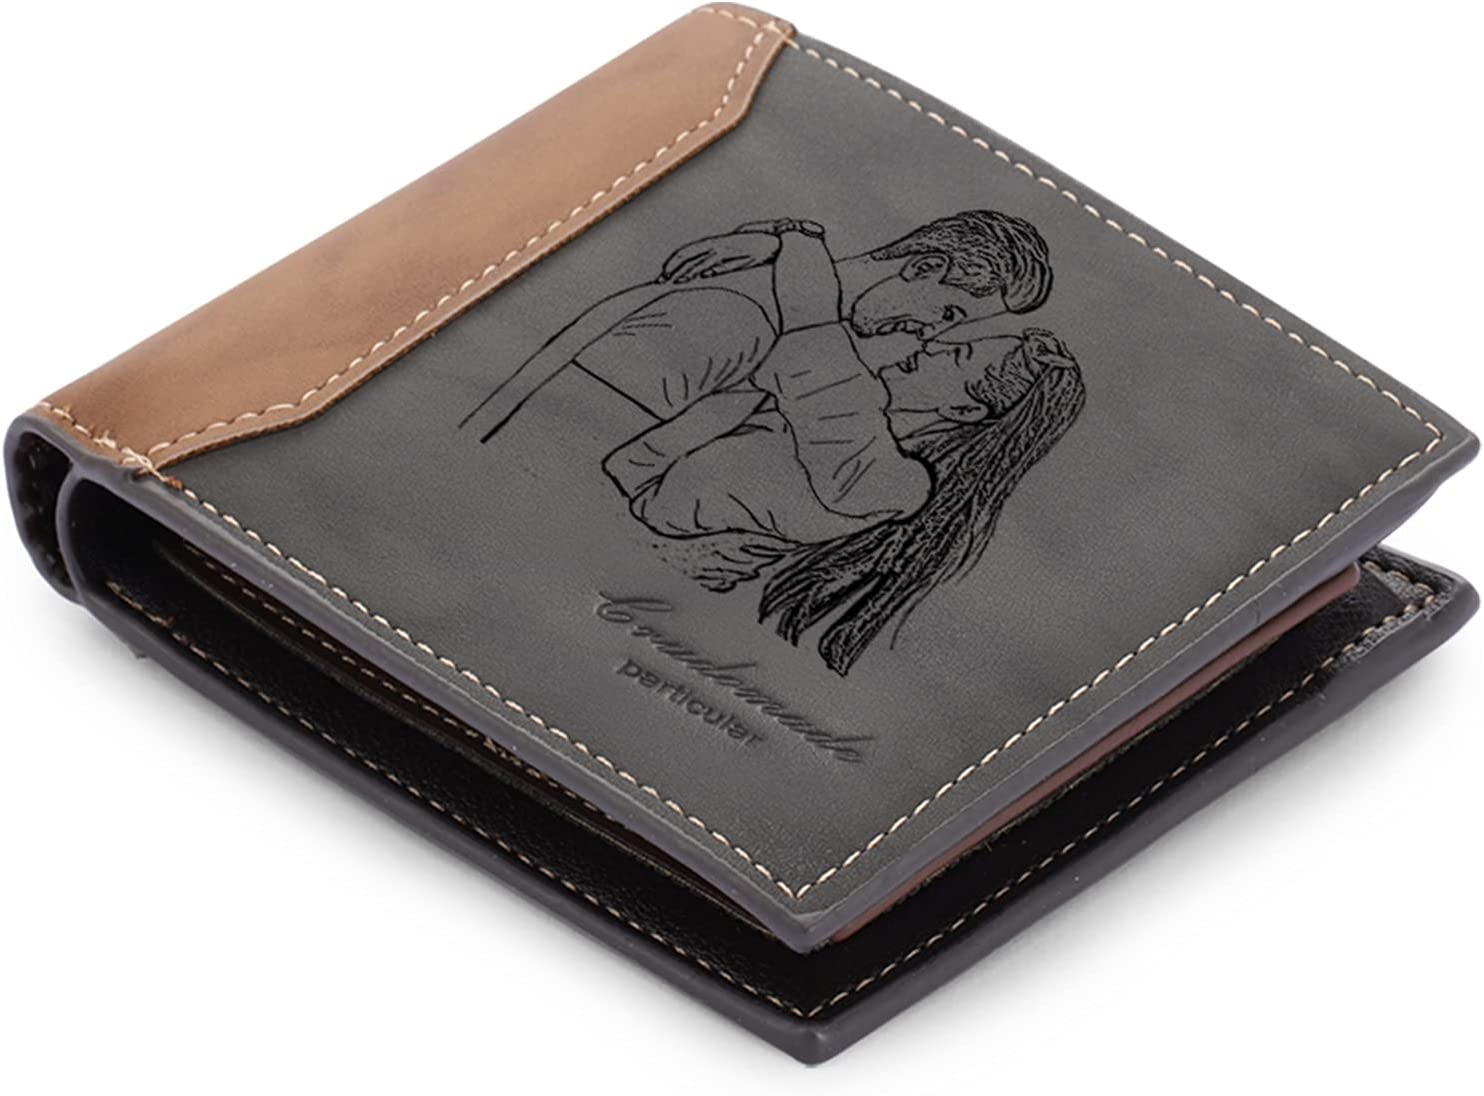 Personalized Wallet for Men - Custom Wallets for Men, LAGOFIT Men's Wallet Custom Engraved Photo Wallet Casual Bifold Wallet Personalized Gifts for Dad, Husband, Boyfriend